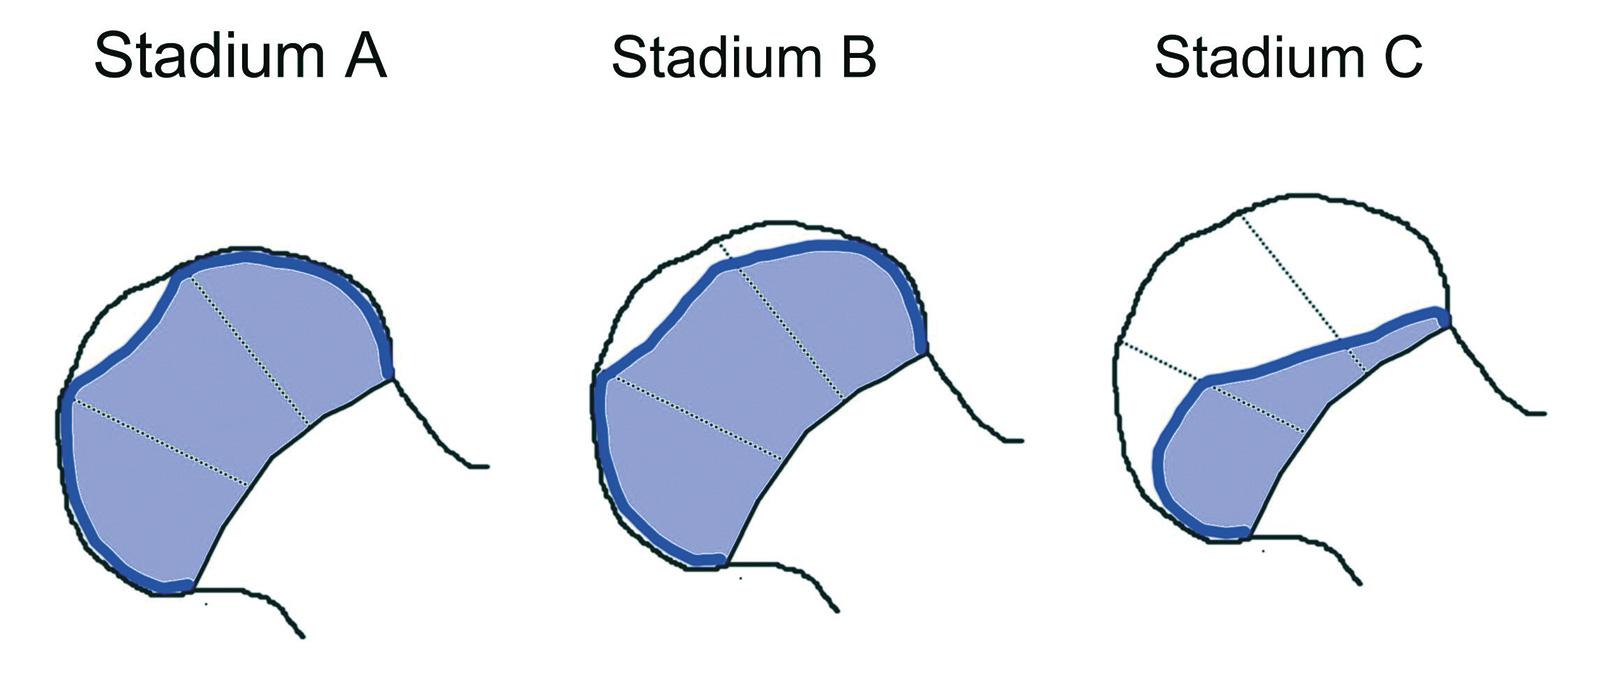 Abb. 4-13: Herring Klassifikation: grau Darstellung des unbeteiligten Kopfanteils